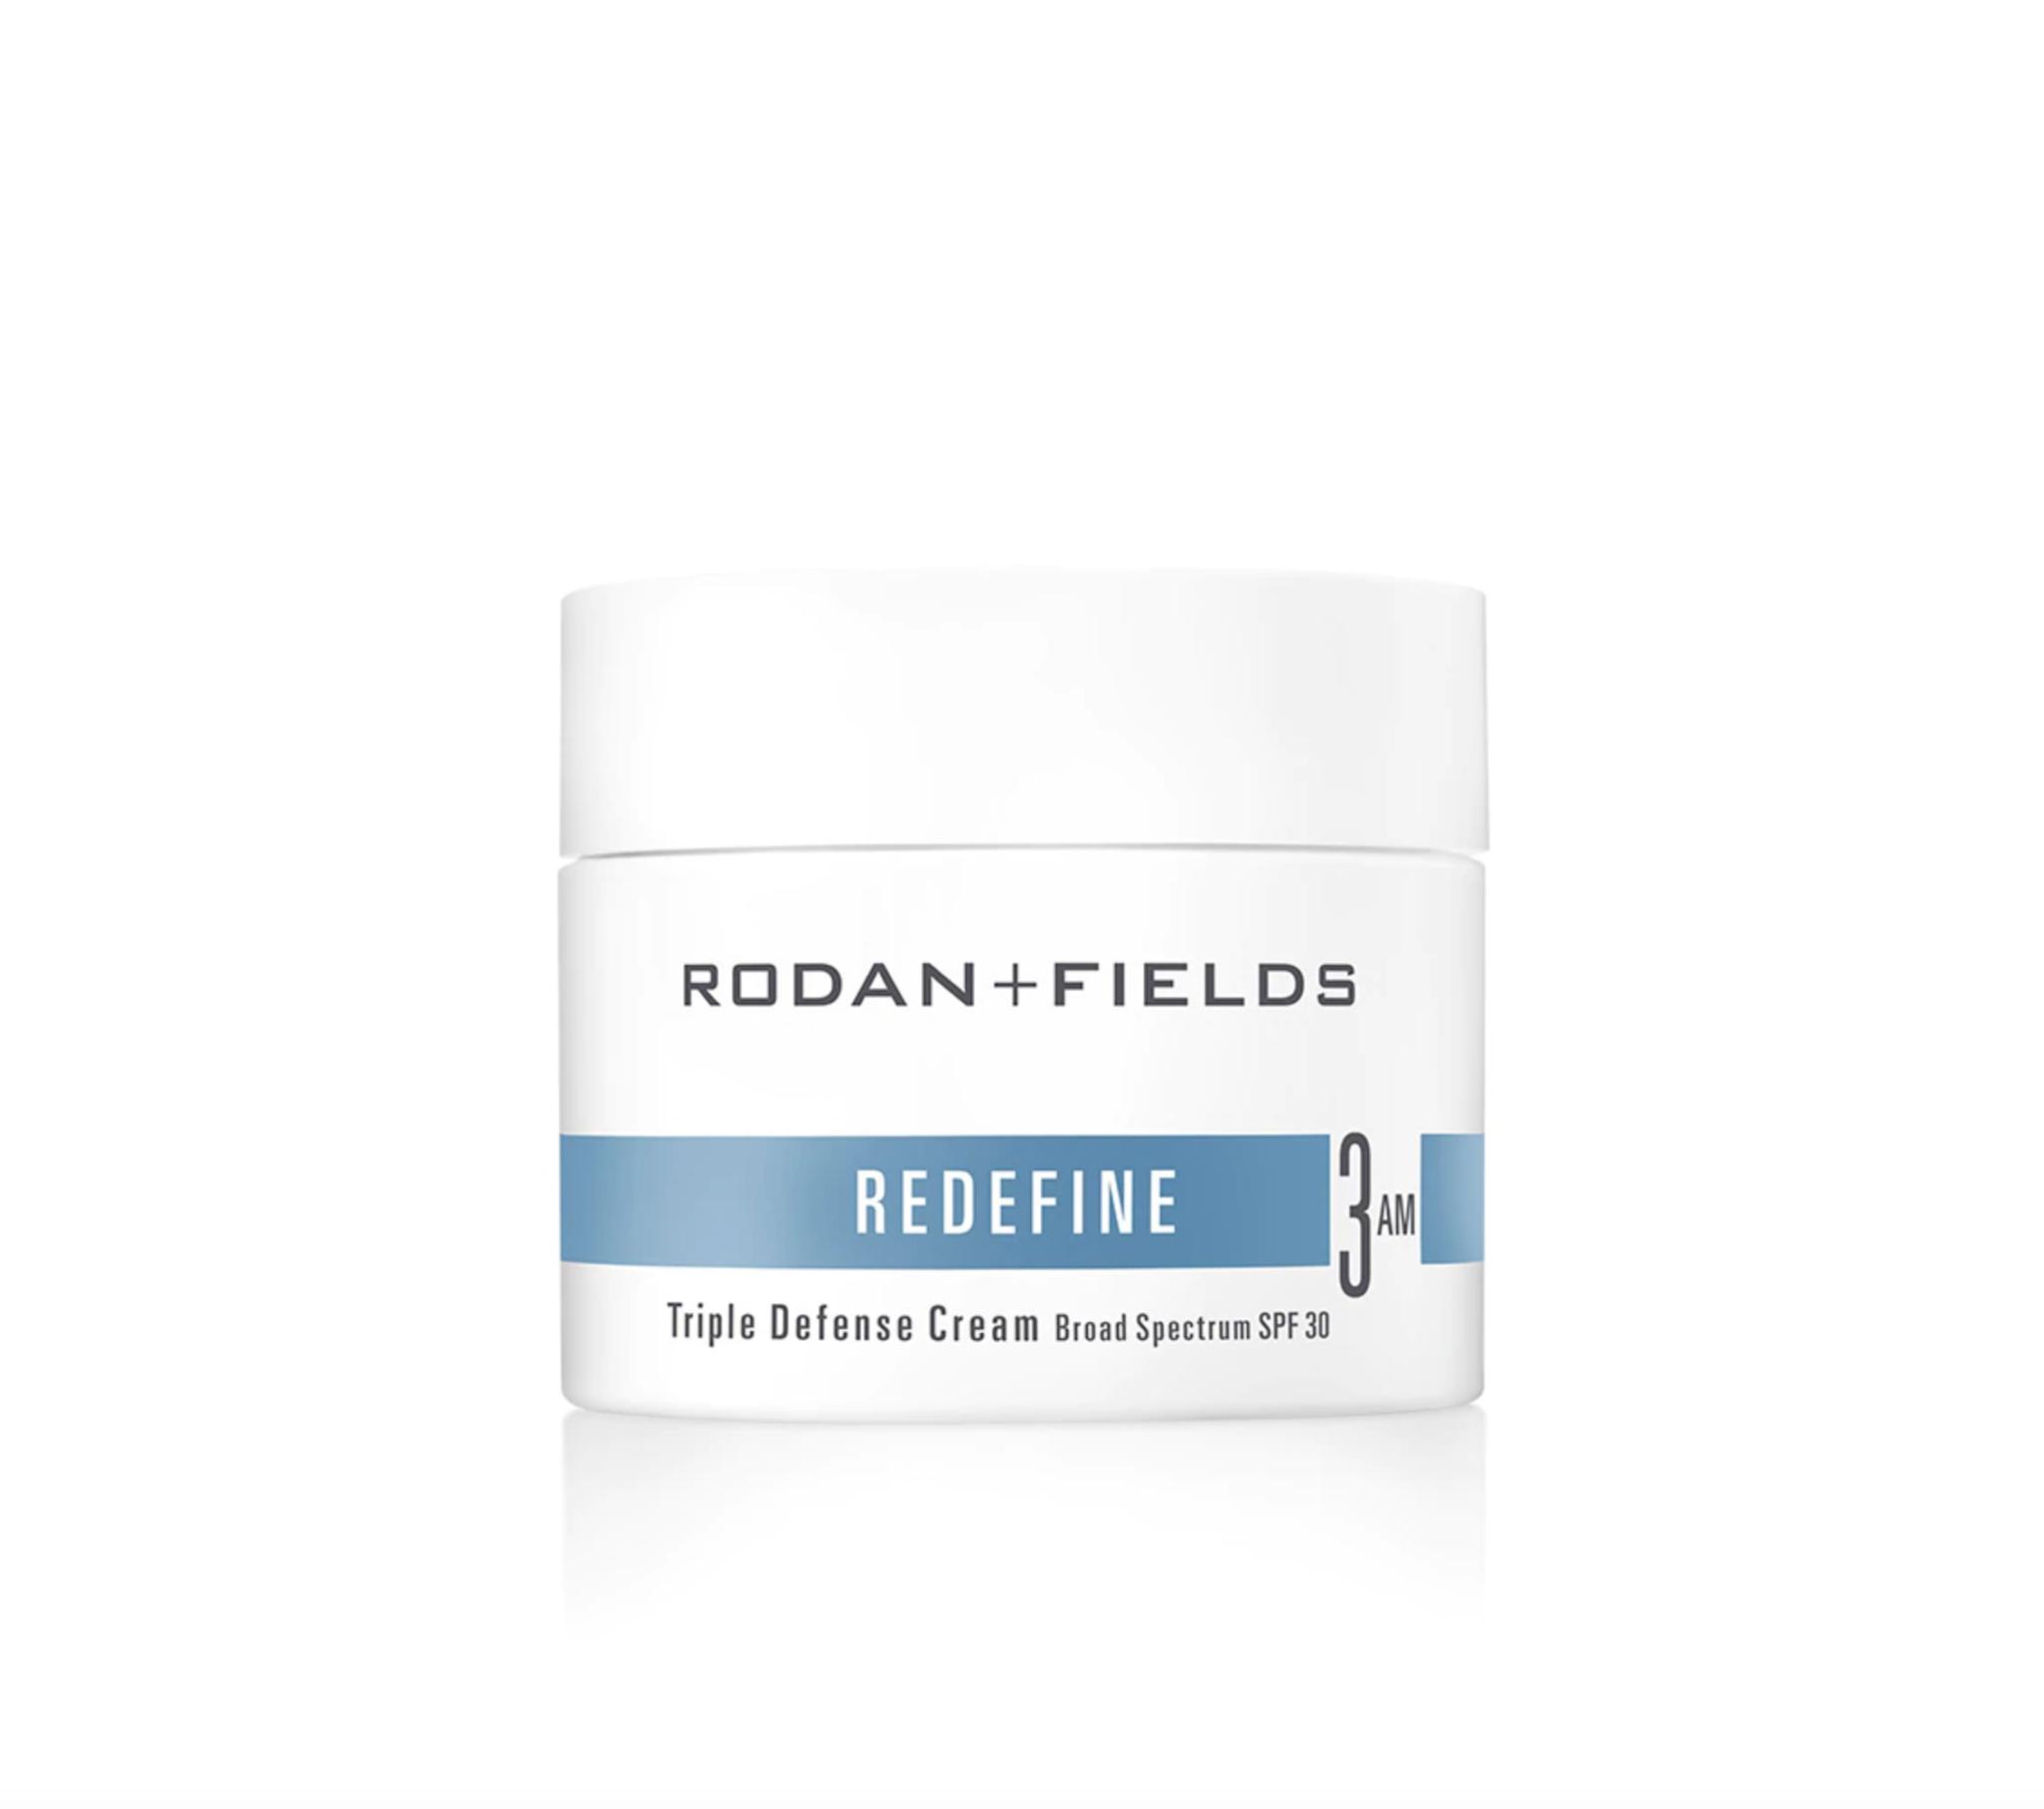 Rodan + Fields REDEFINE Triple Defense Cream Broad Spectrum SPF 30 | Debbie Savage Orange County Beauty and Lifestyle Blogger